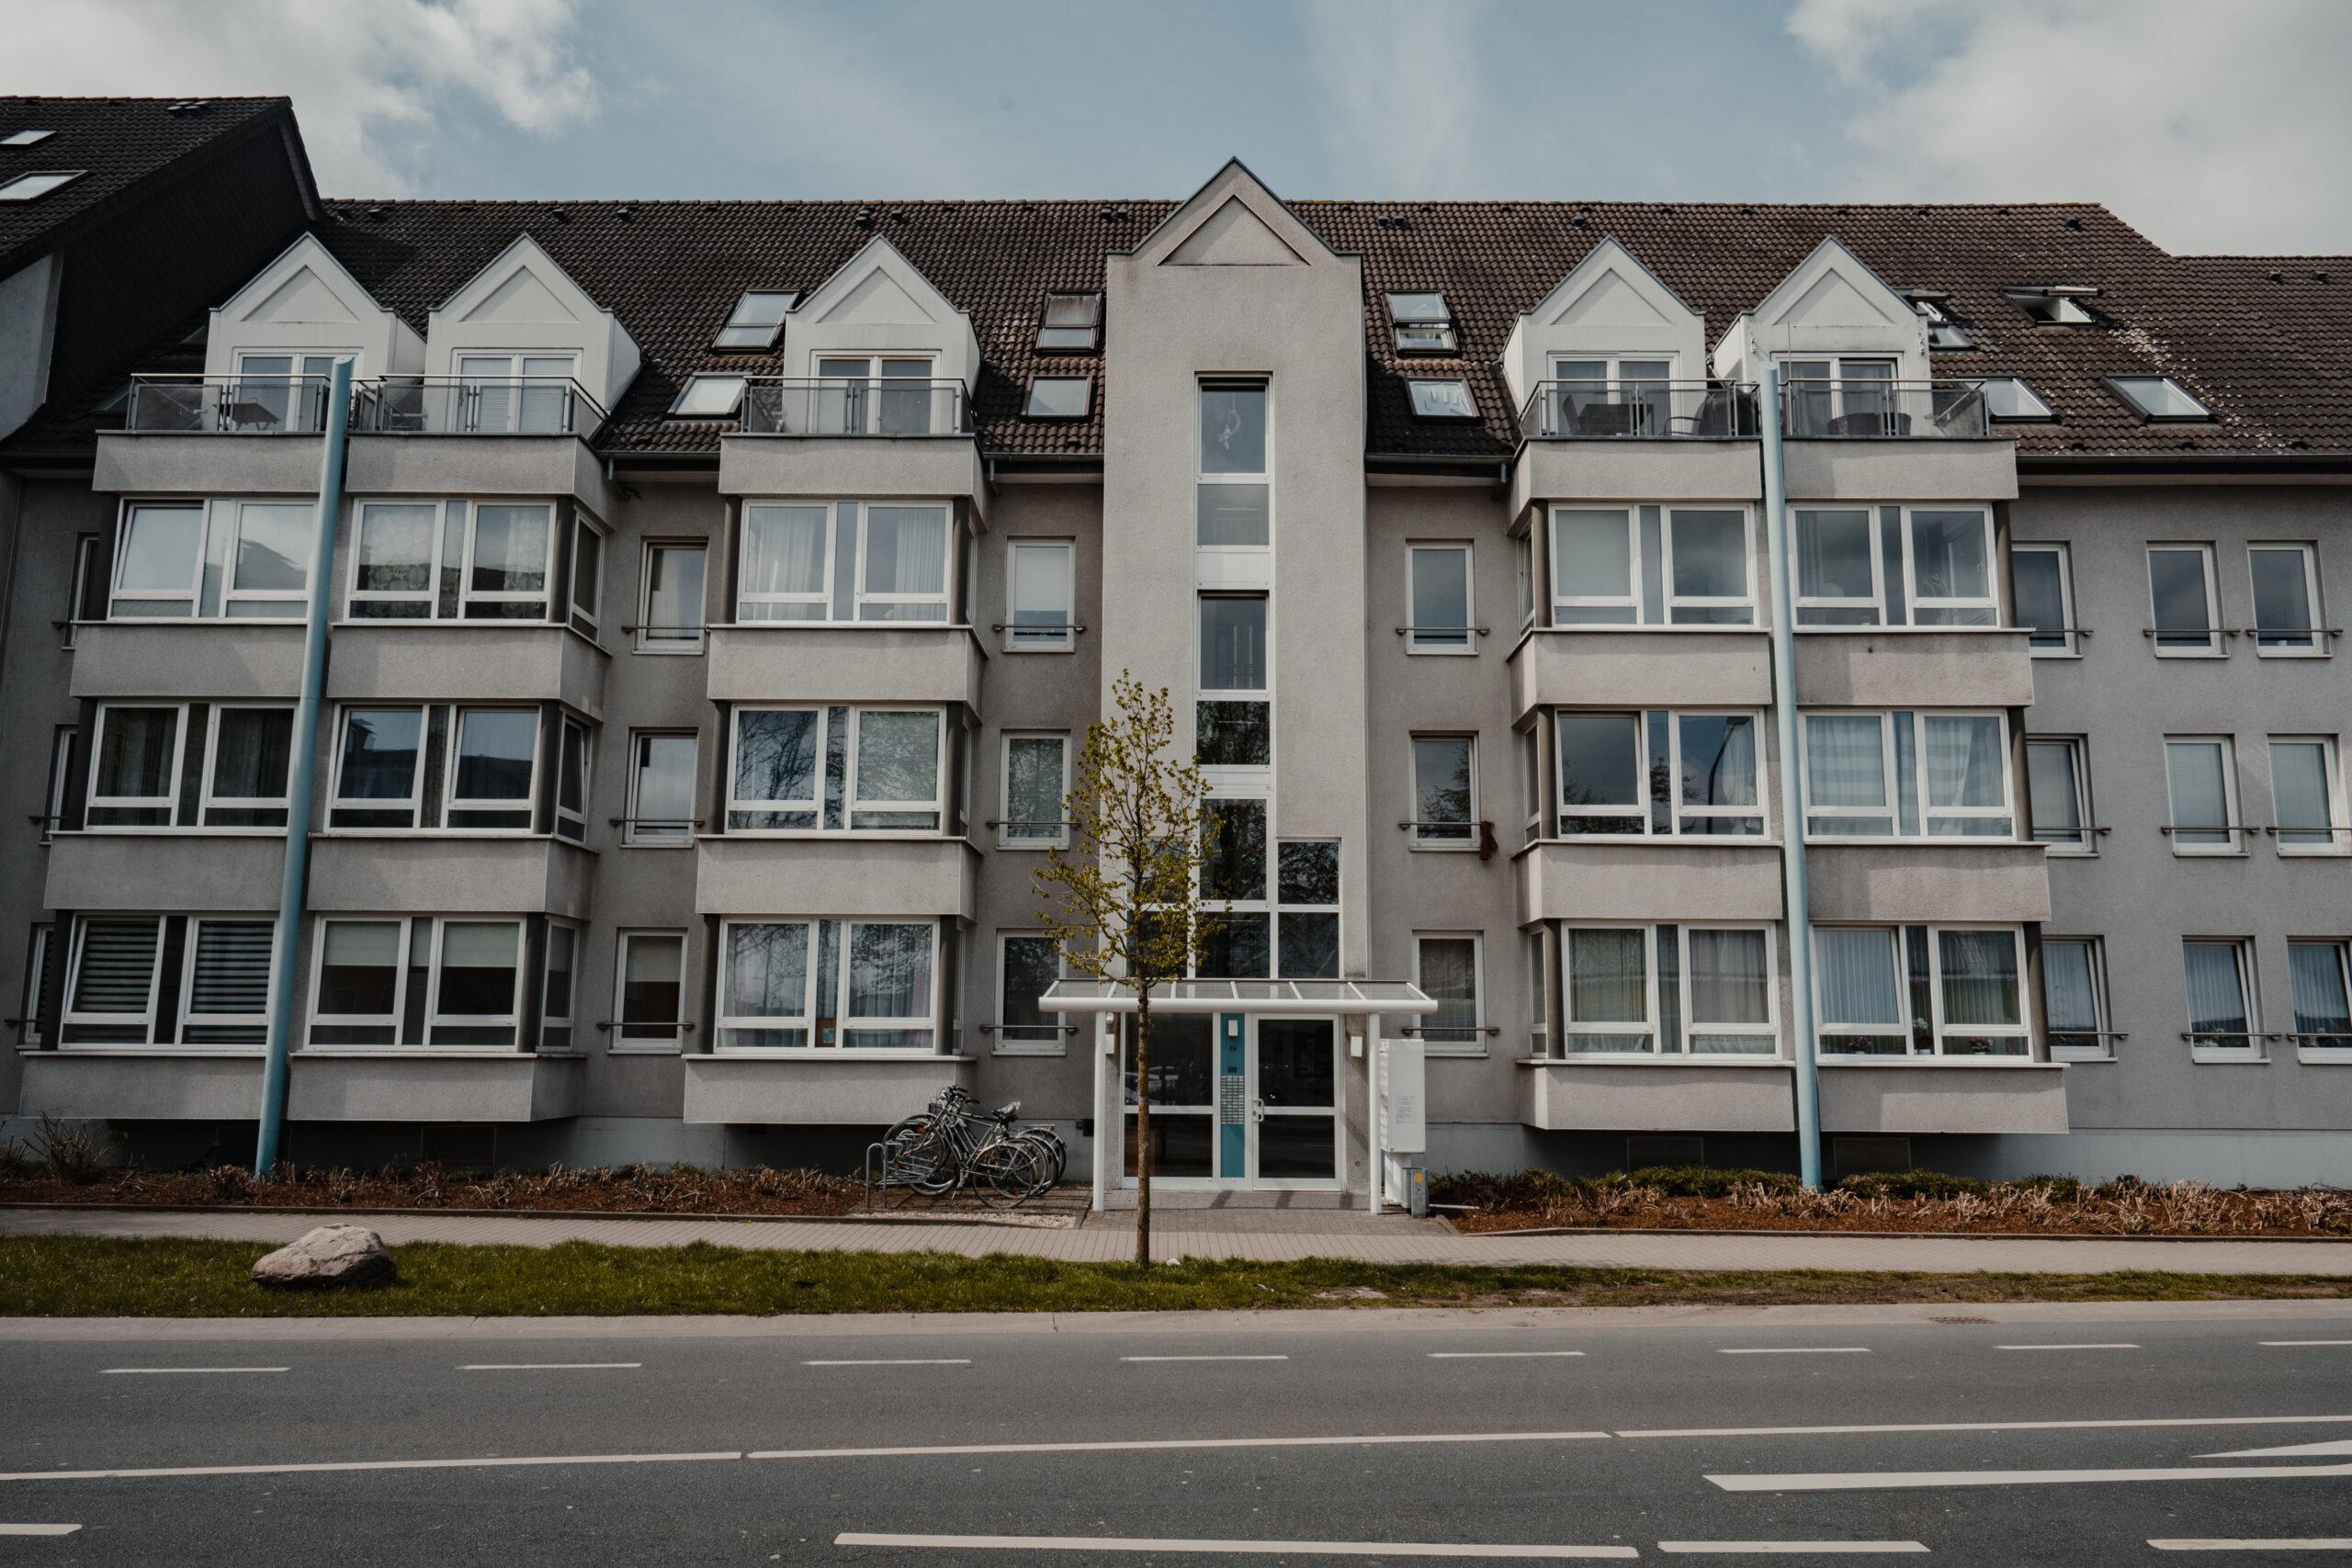 Mietwohnung, Nordstraße 29, Paderborn